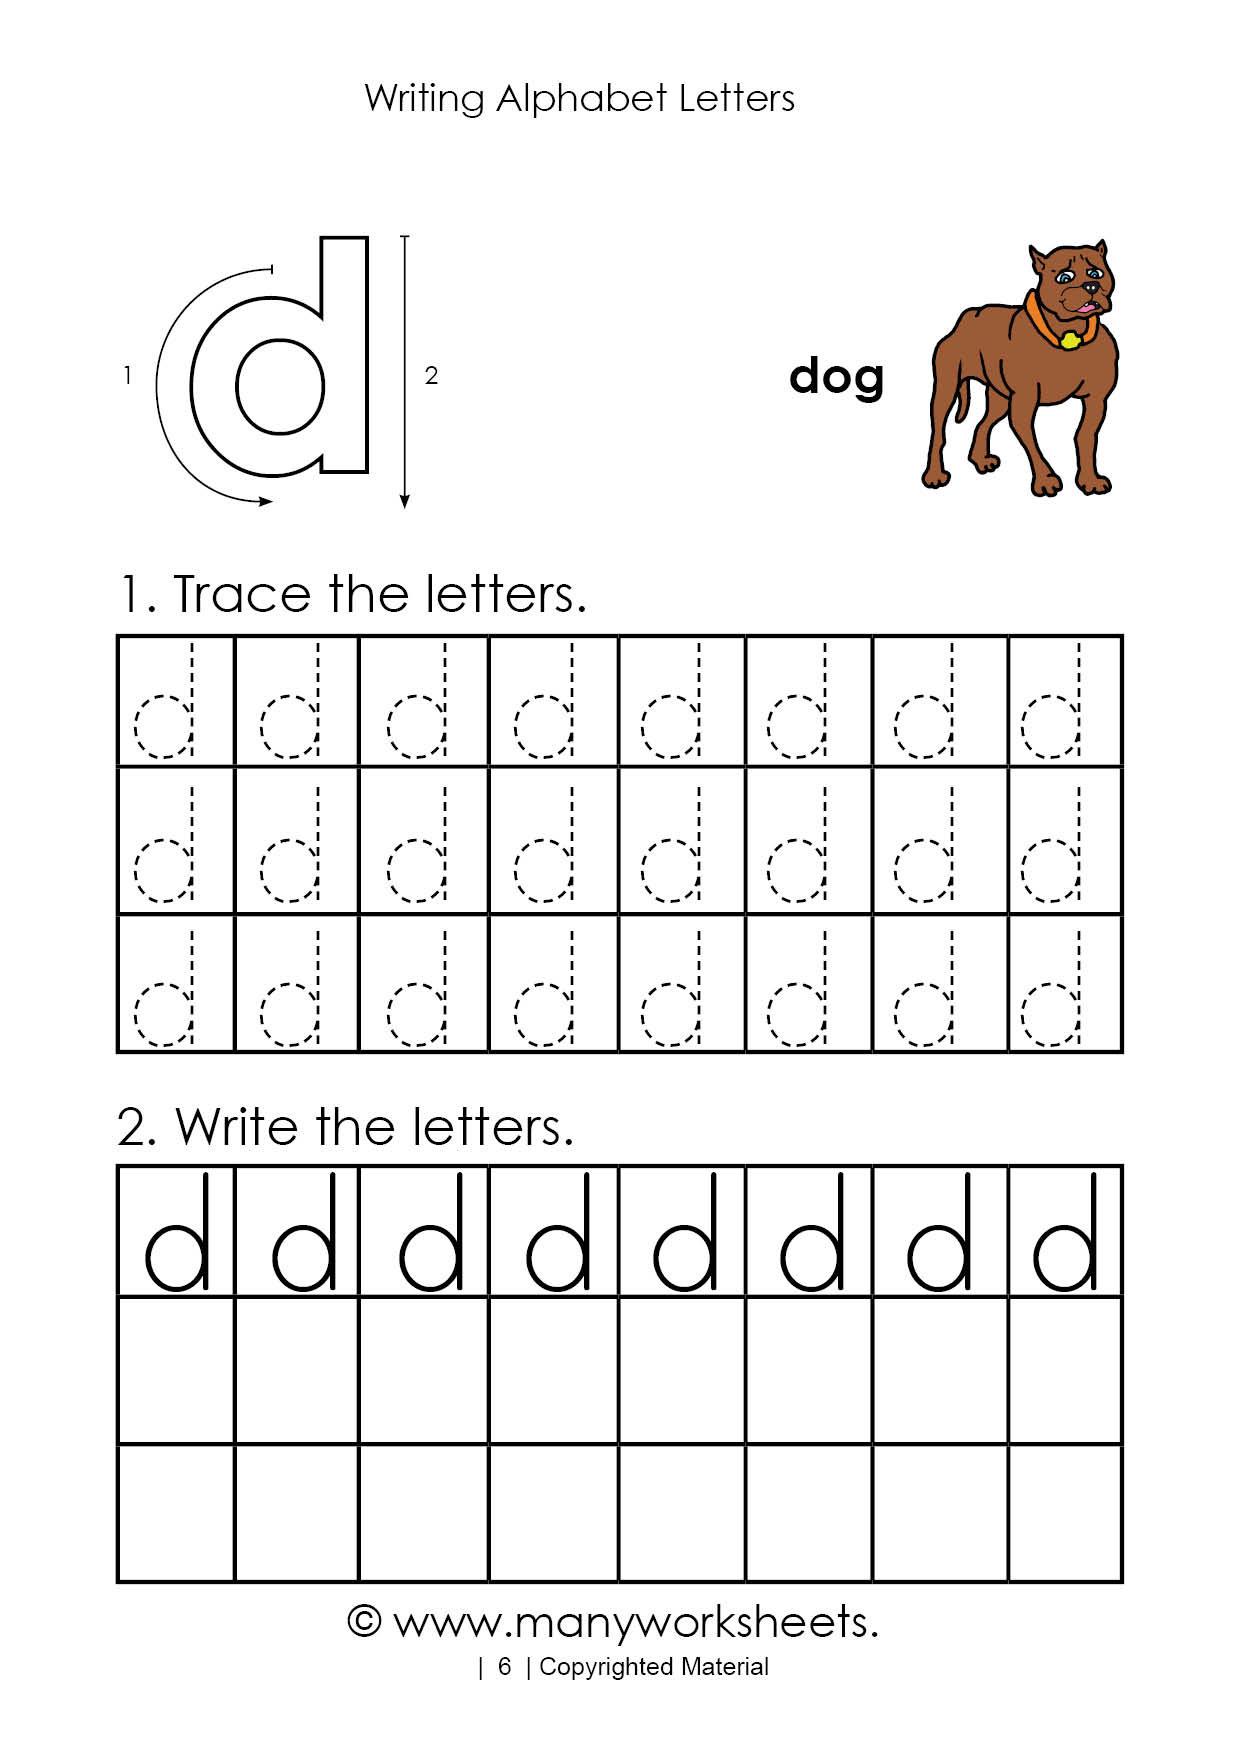 Letter D Worksheet for Preschool Tracing Letter D Worksheet for Kindergarten